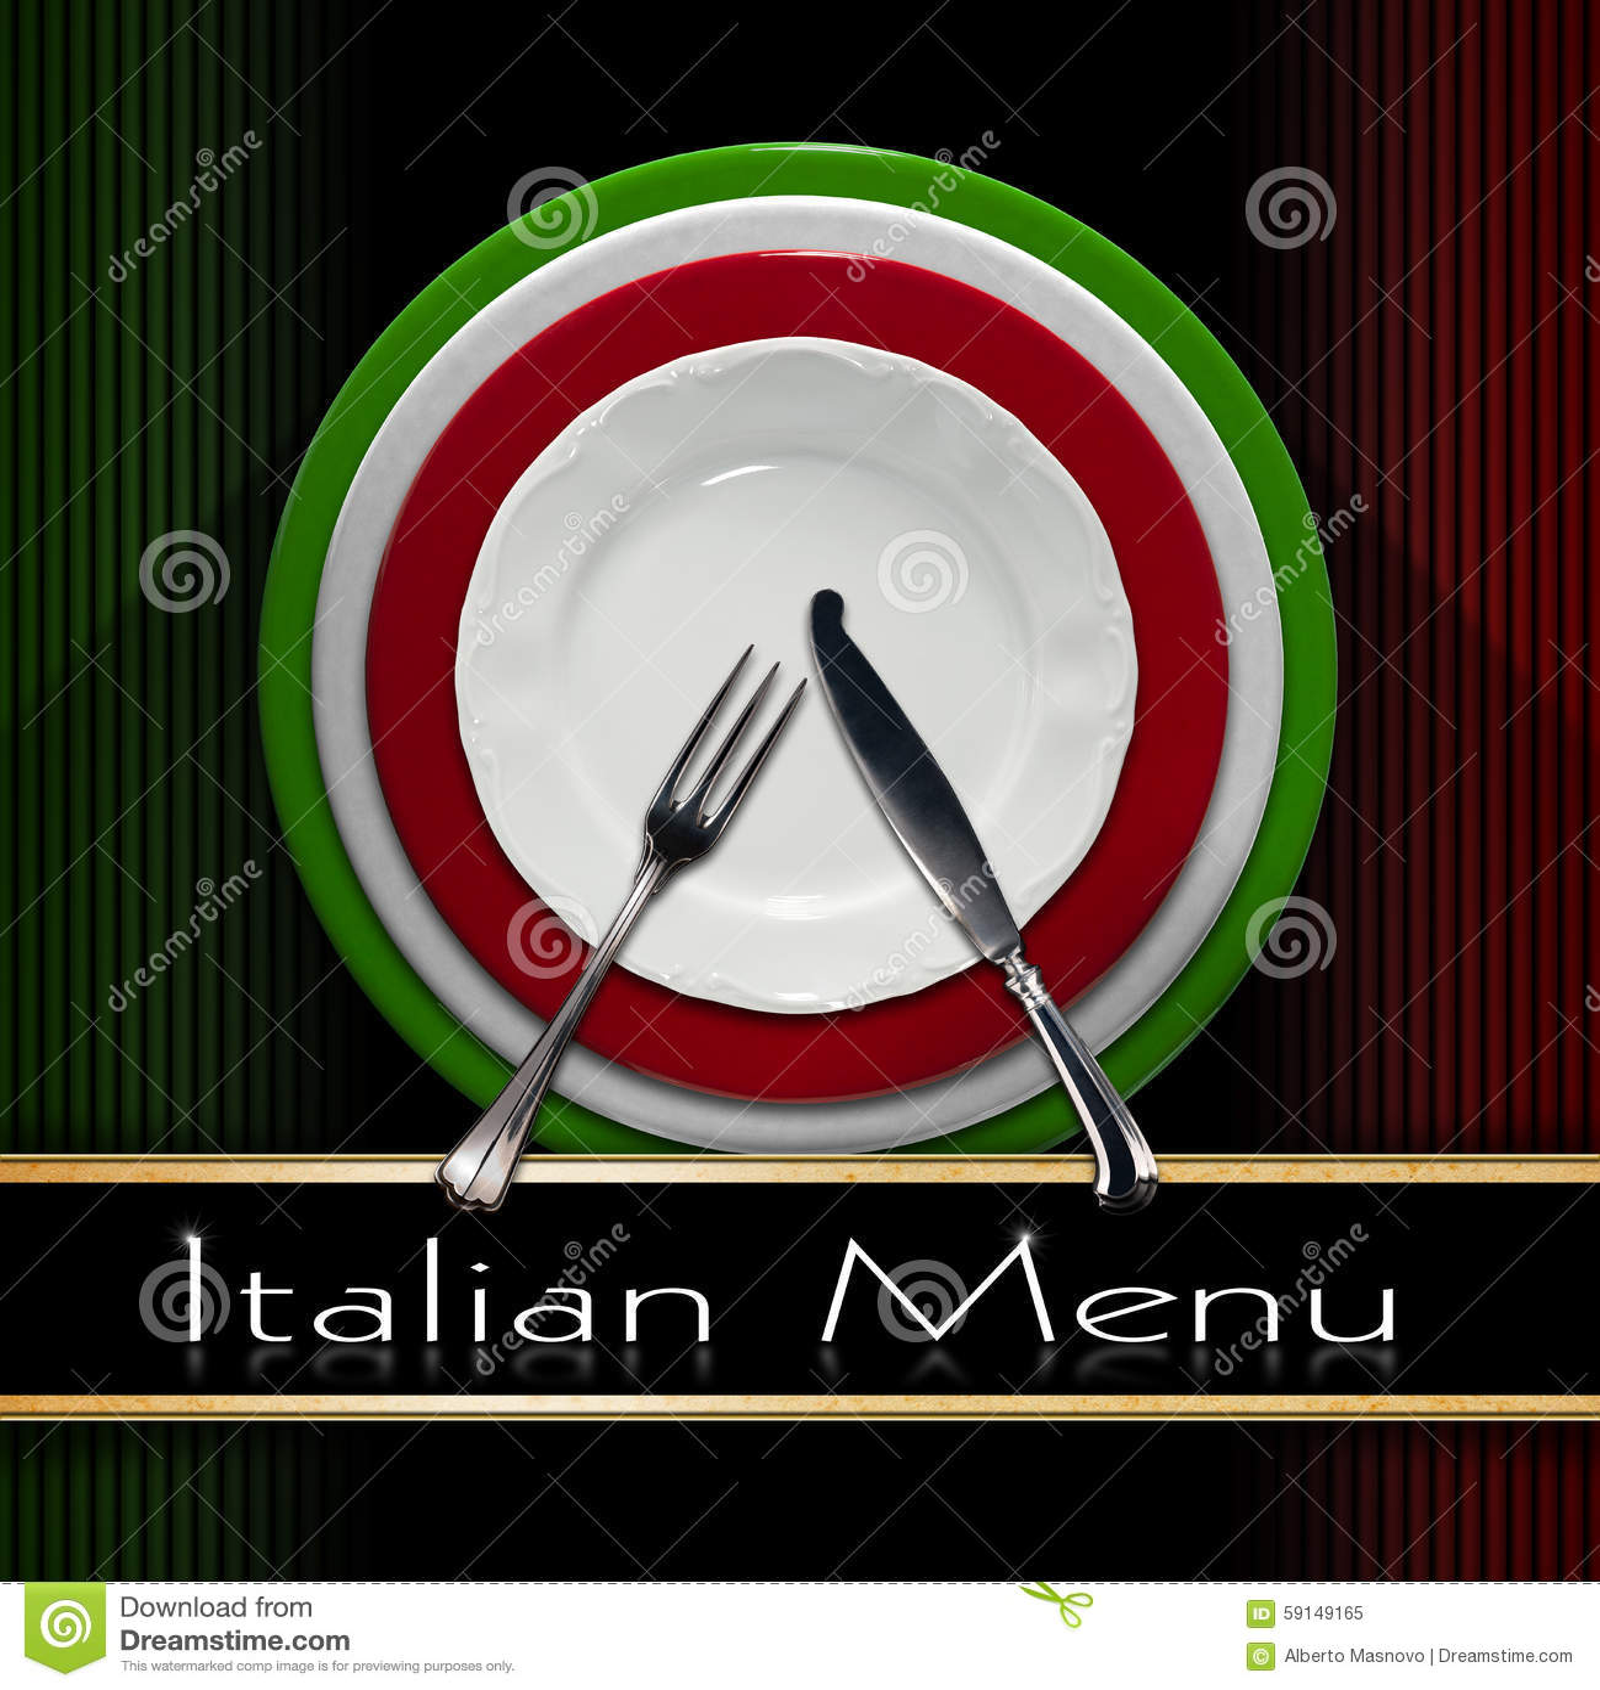 Italian Restaurant Menu Design Stock Illustration - Image ... - photo#38